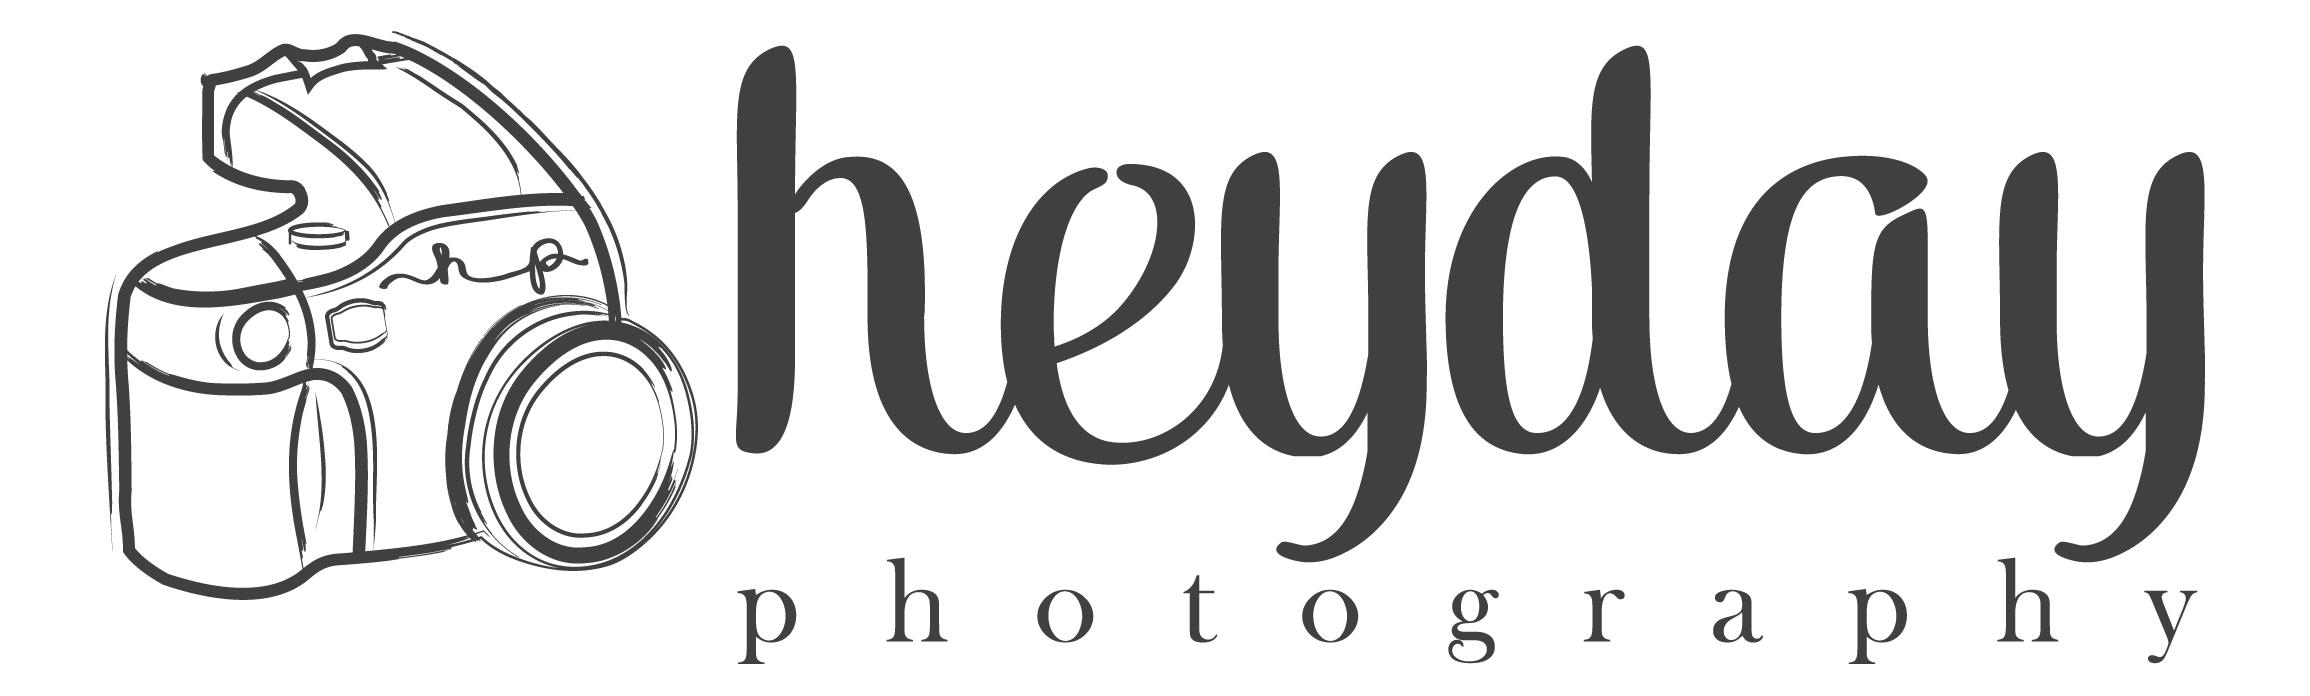 heyday photography